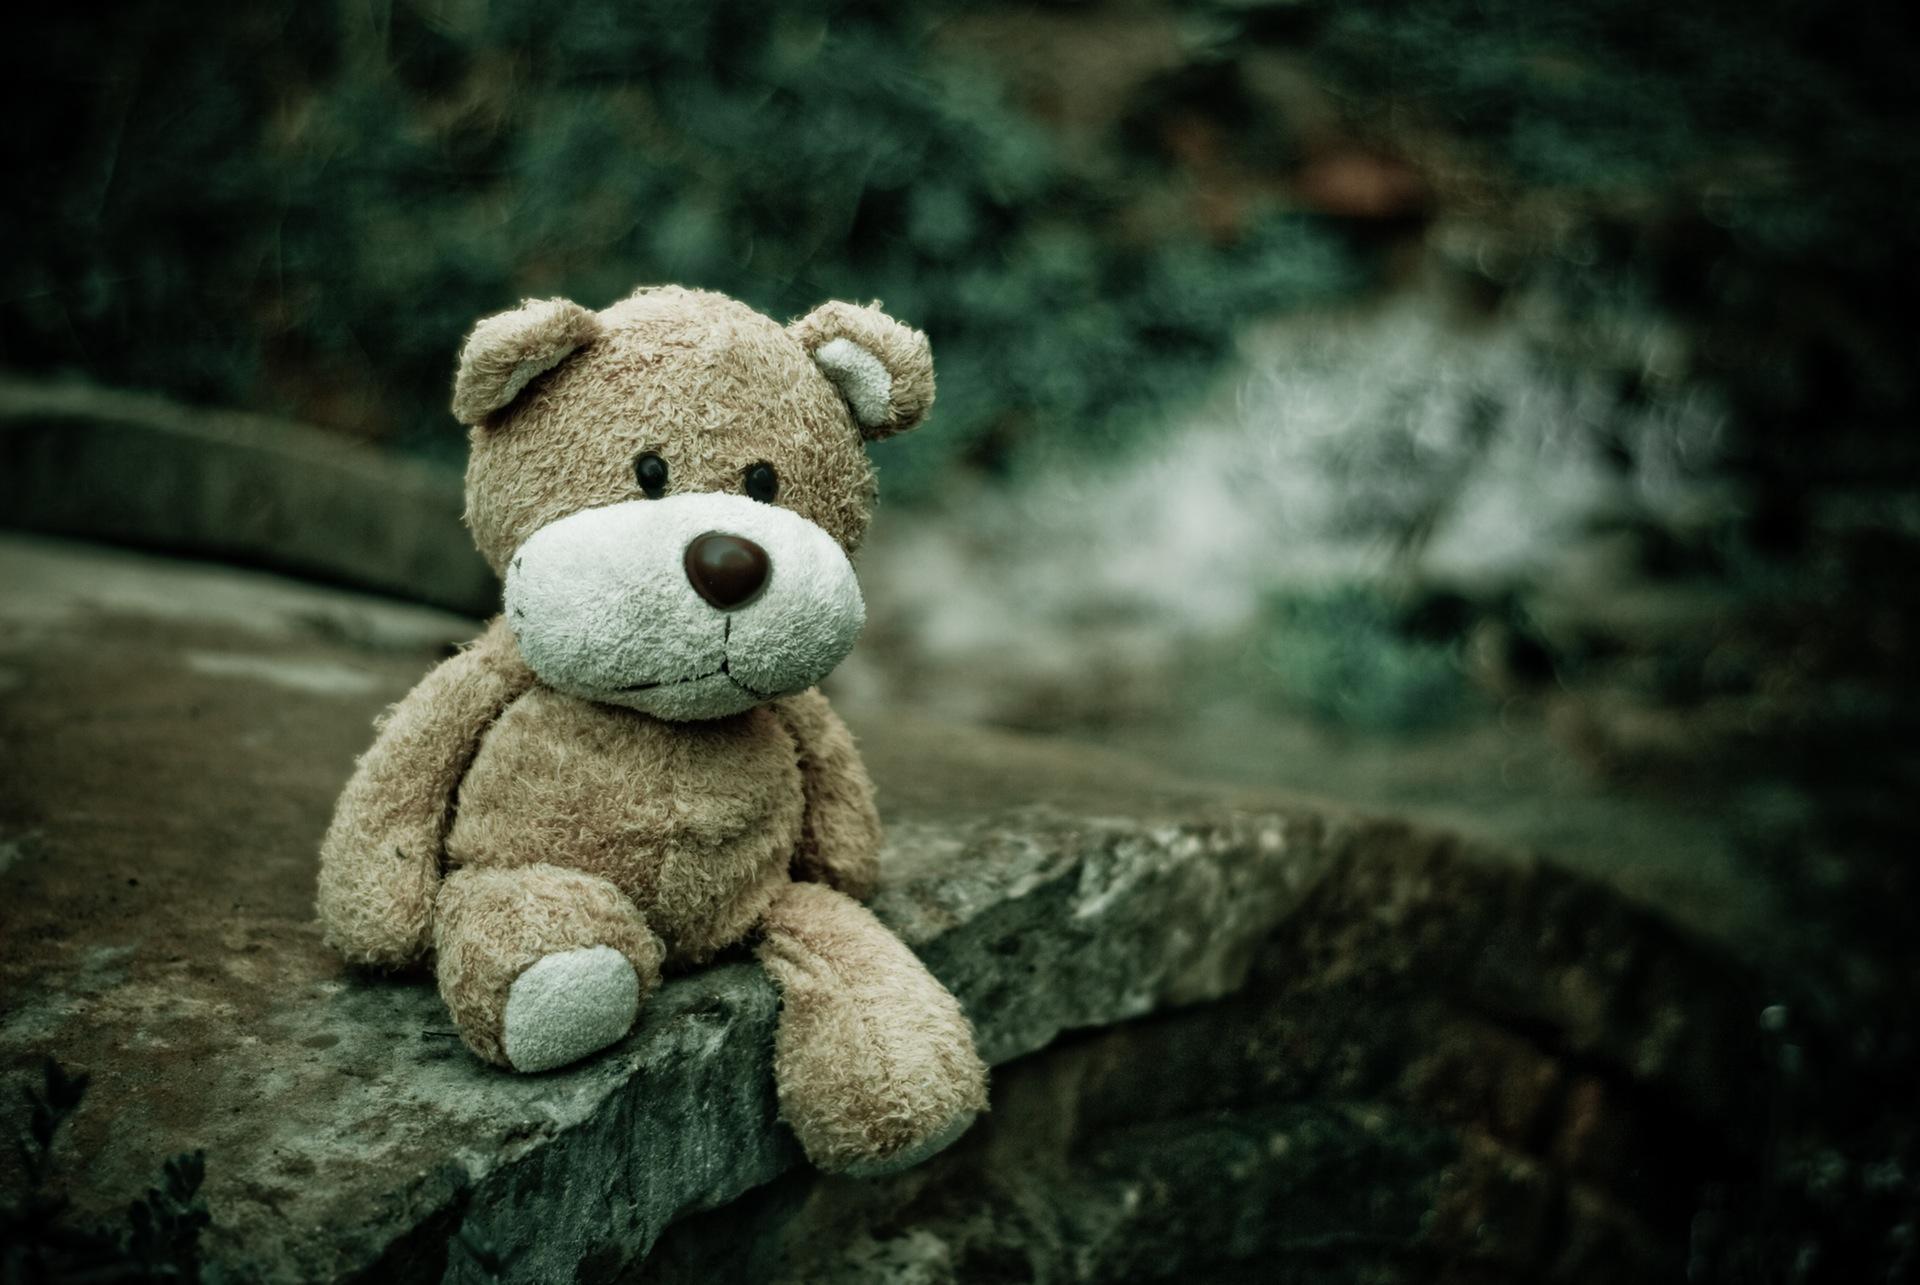 Teddy bear, Teddy, Brücke, Zärtlichkeit, Natur - Wallpaper HD - Prof.-falken.com